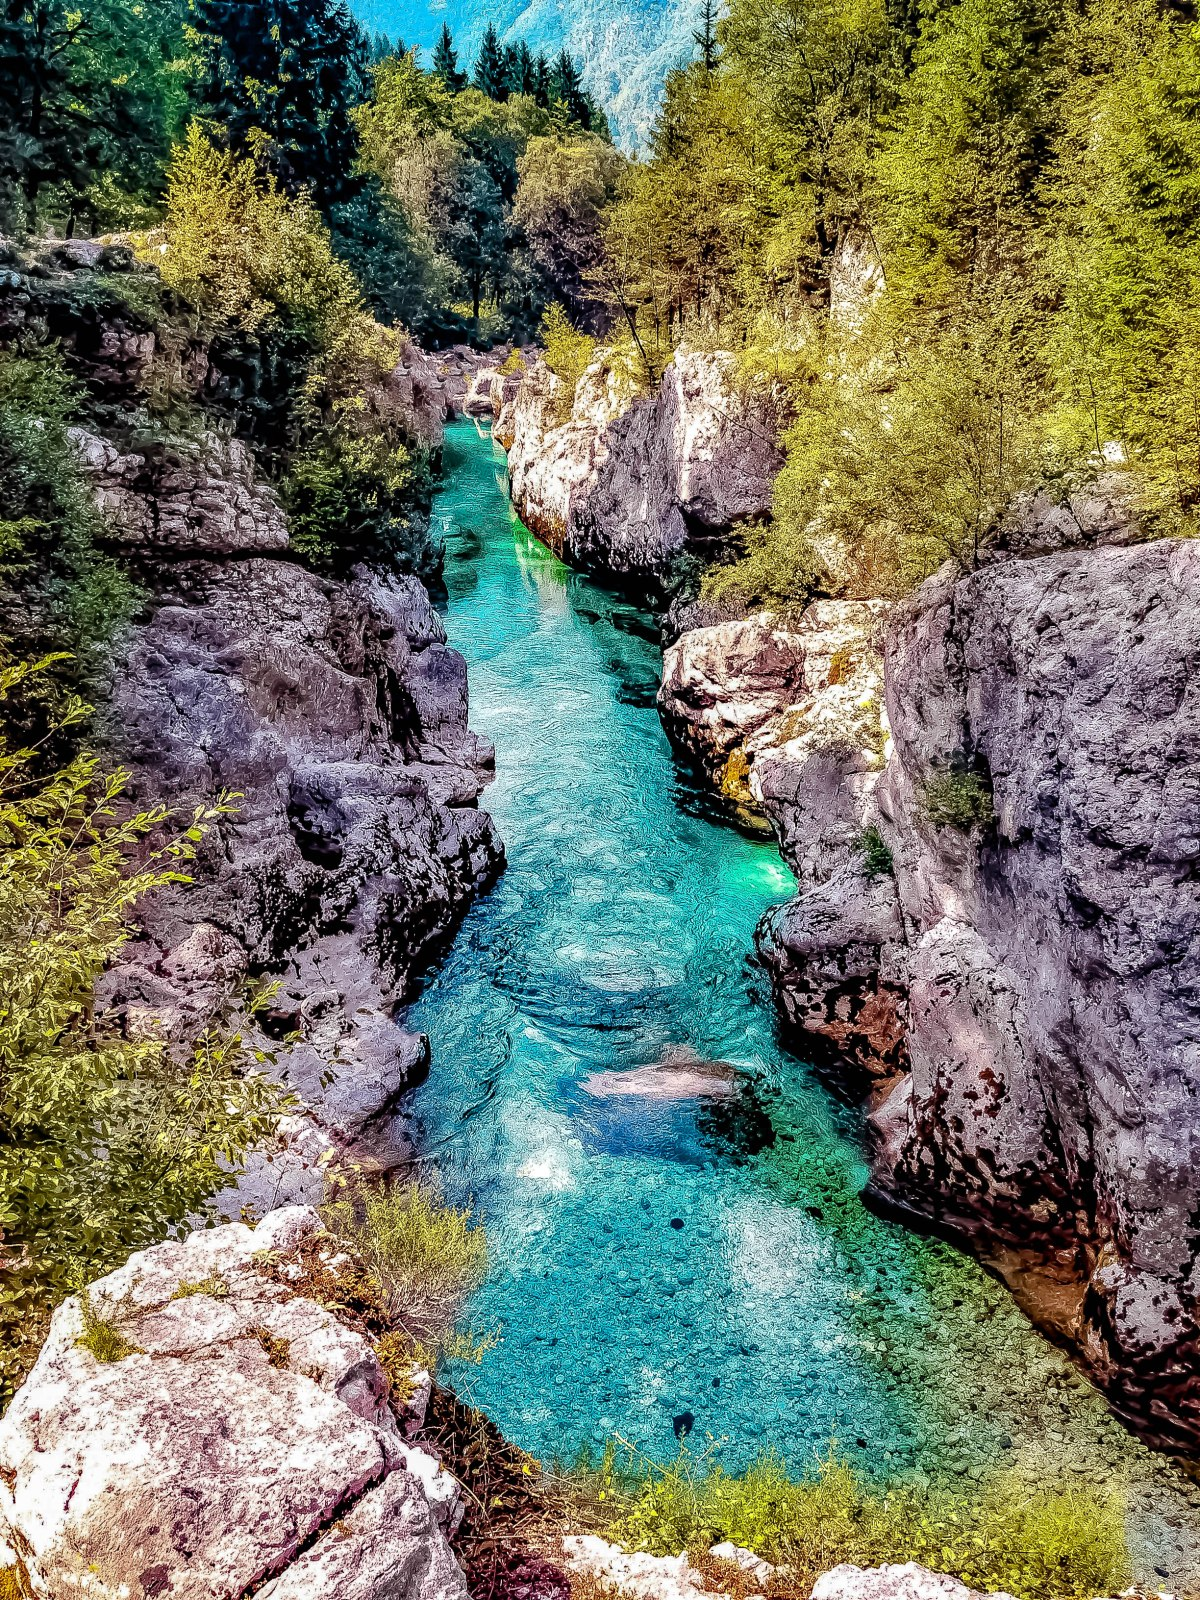 Alpe Adria Trail Etappe 23: Kransjka Gora –Trenta